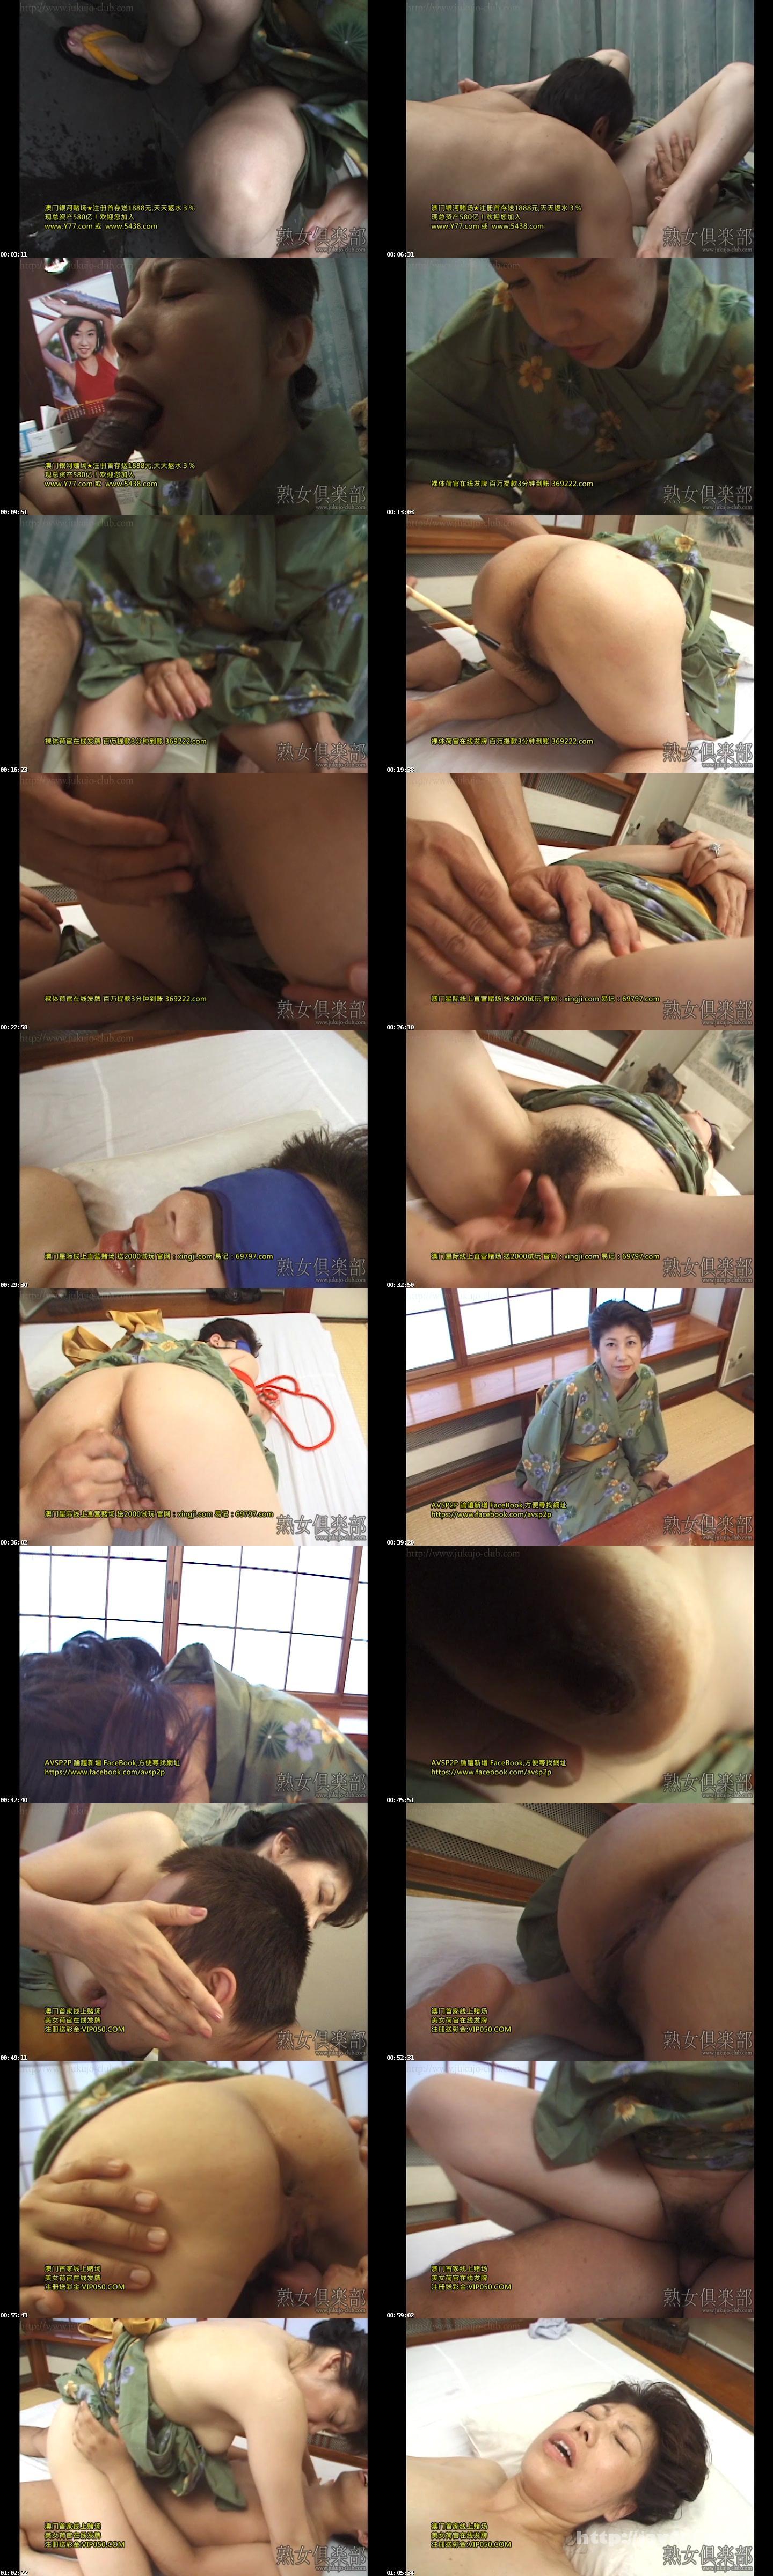 Jukujo club 5712 和服の似合う女将さんは例外なくドスケベ   熟女倶楽部 中村智子 Jukujo club